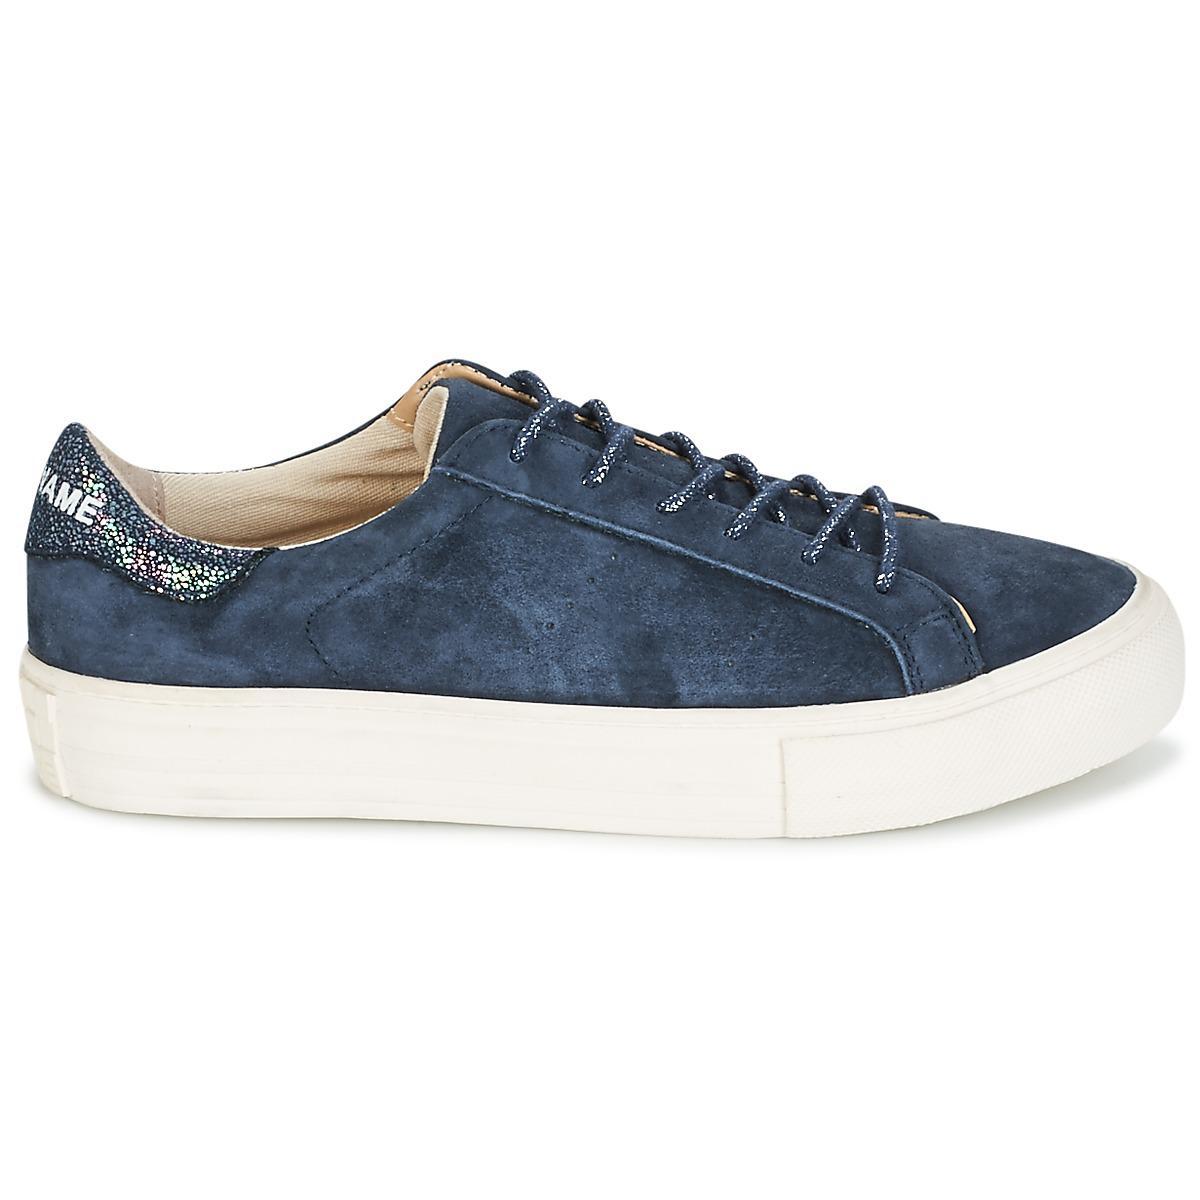 No Name ARCADE SNEAKER women's Shoes (Trainers) in Cheap Footlocker Finishline PnhLjA4